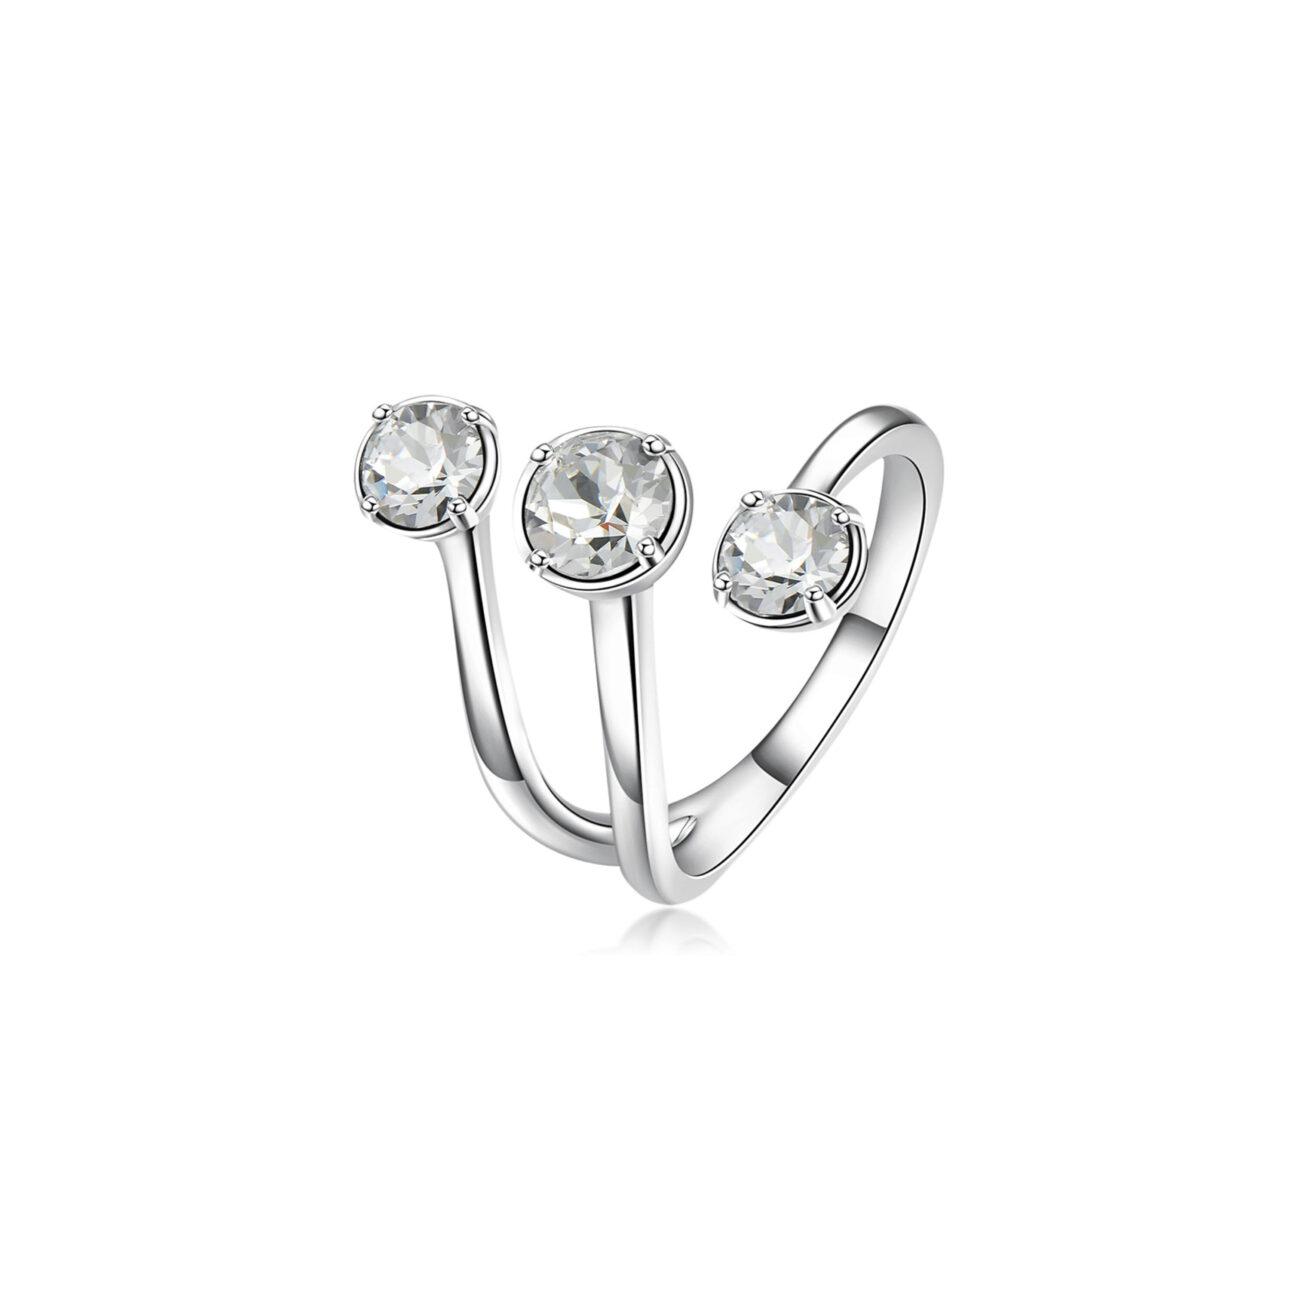 Rhodiated brass ring and white Swarovski©crystals